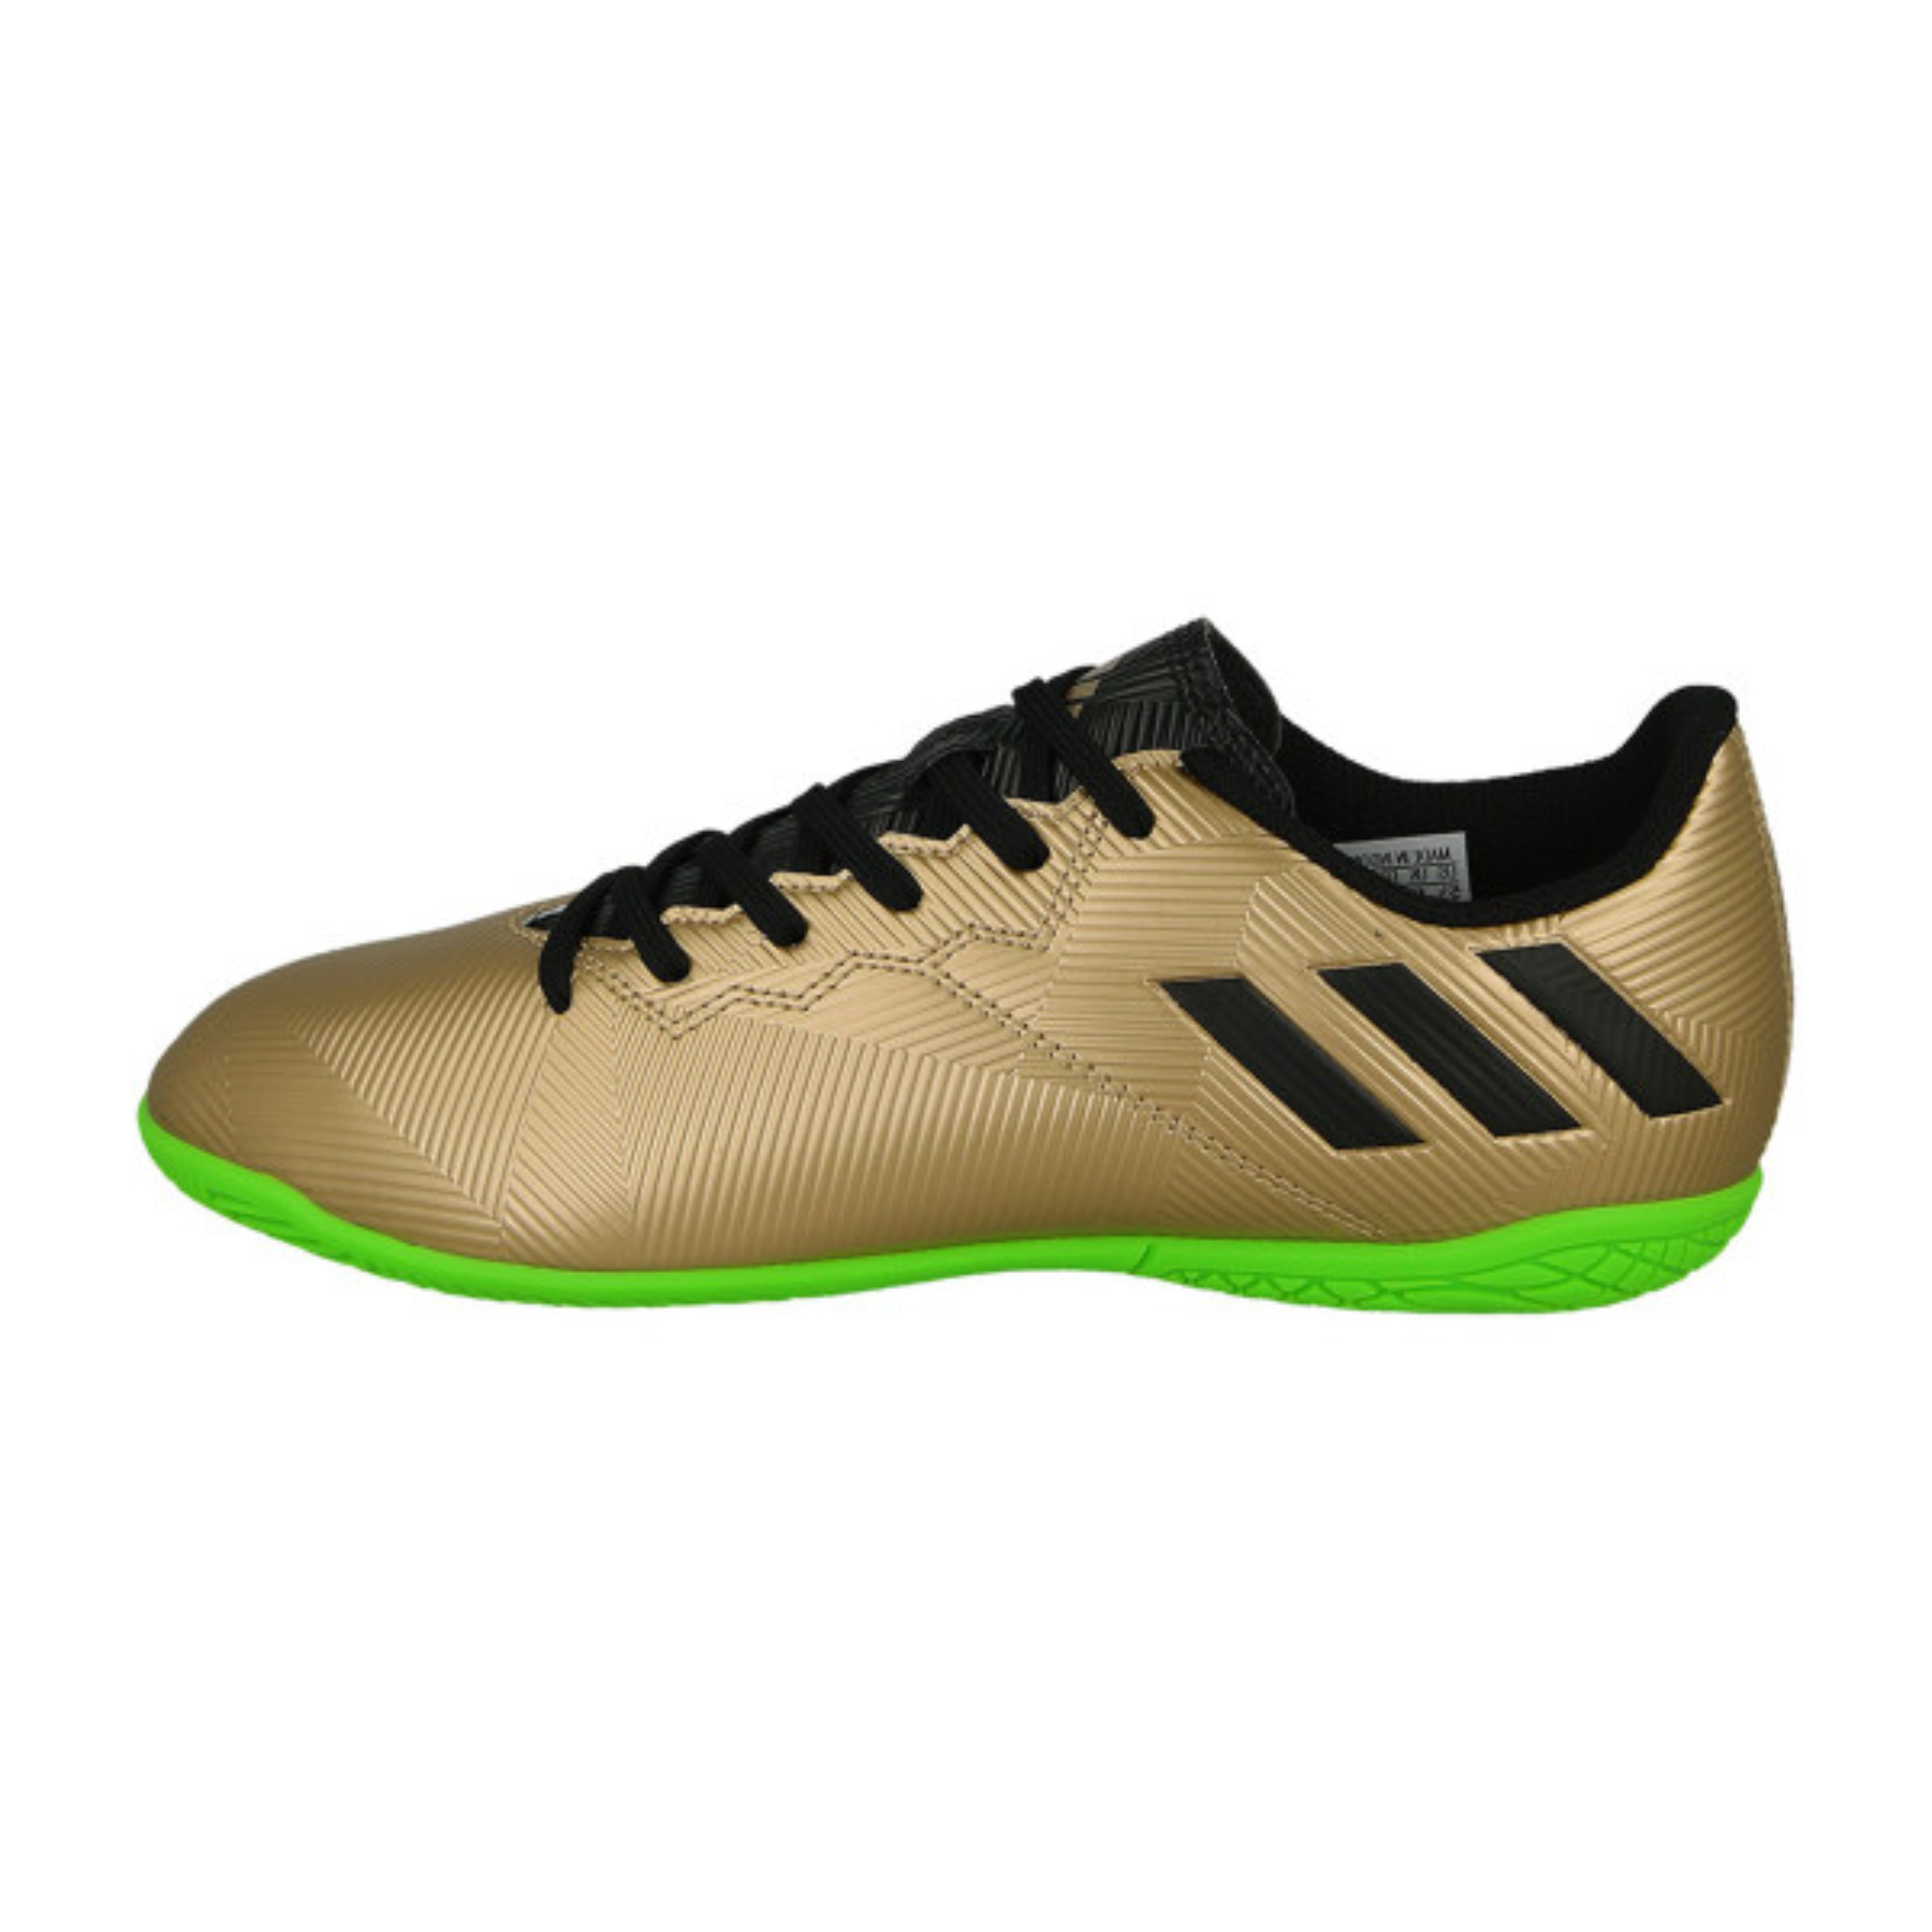 کفش مخصوص فوتسال پسرانه آدیداس سری Messi 16.4 IN مدل BA9863